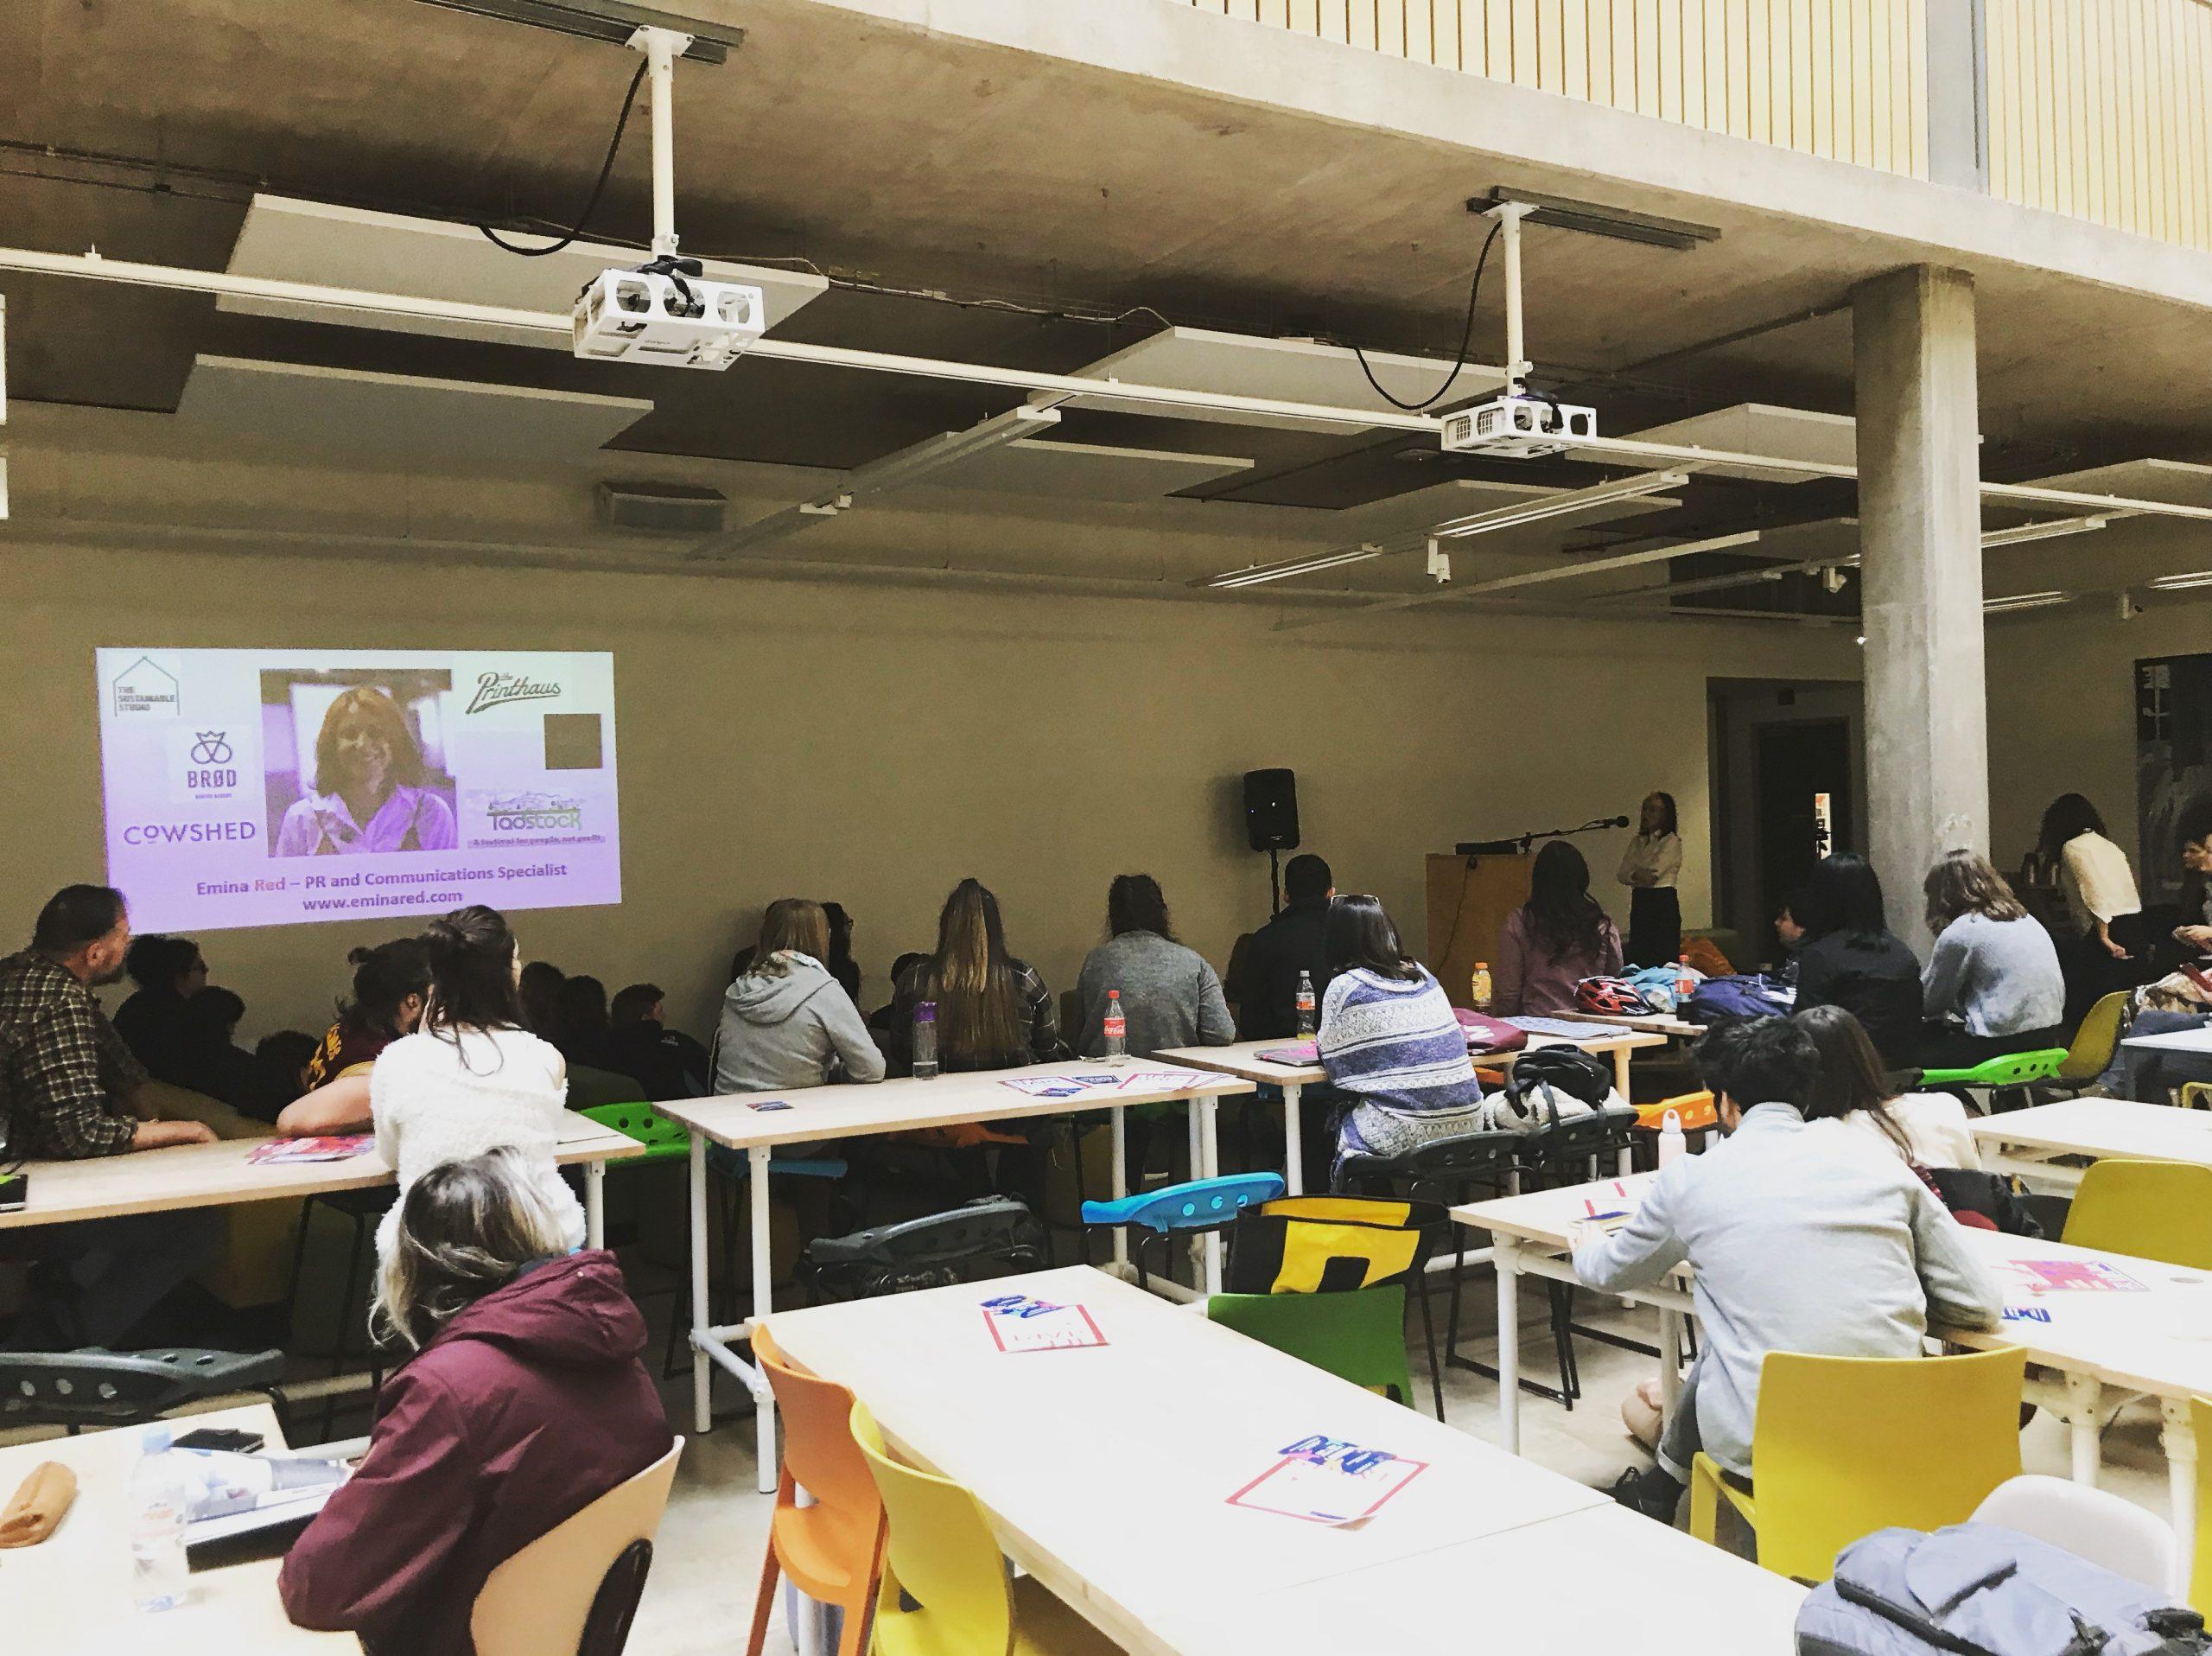 emina speaking in an auditorium to students